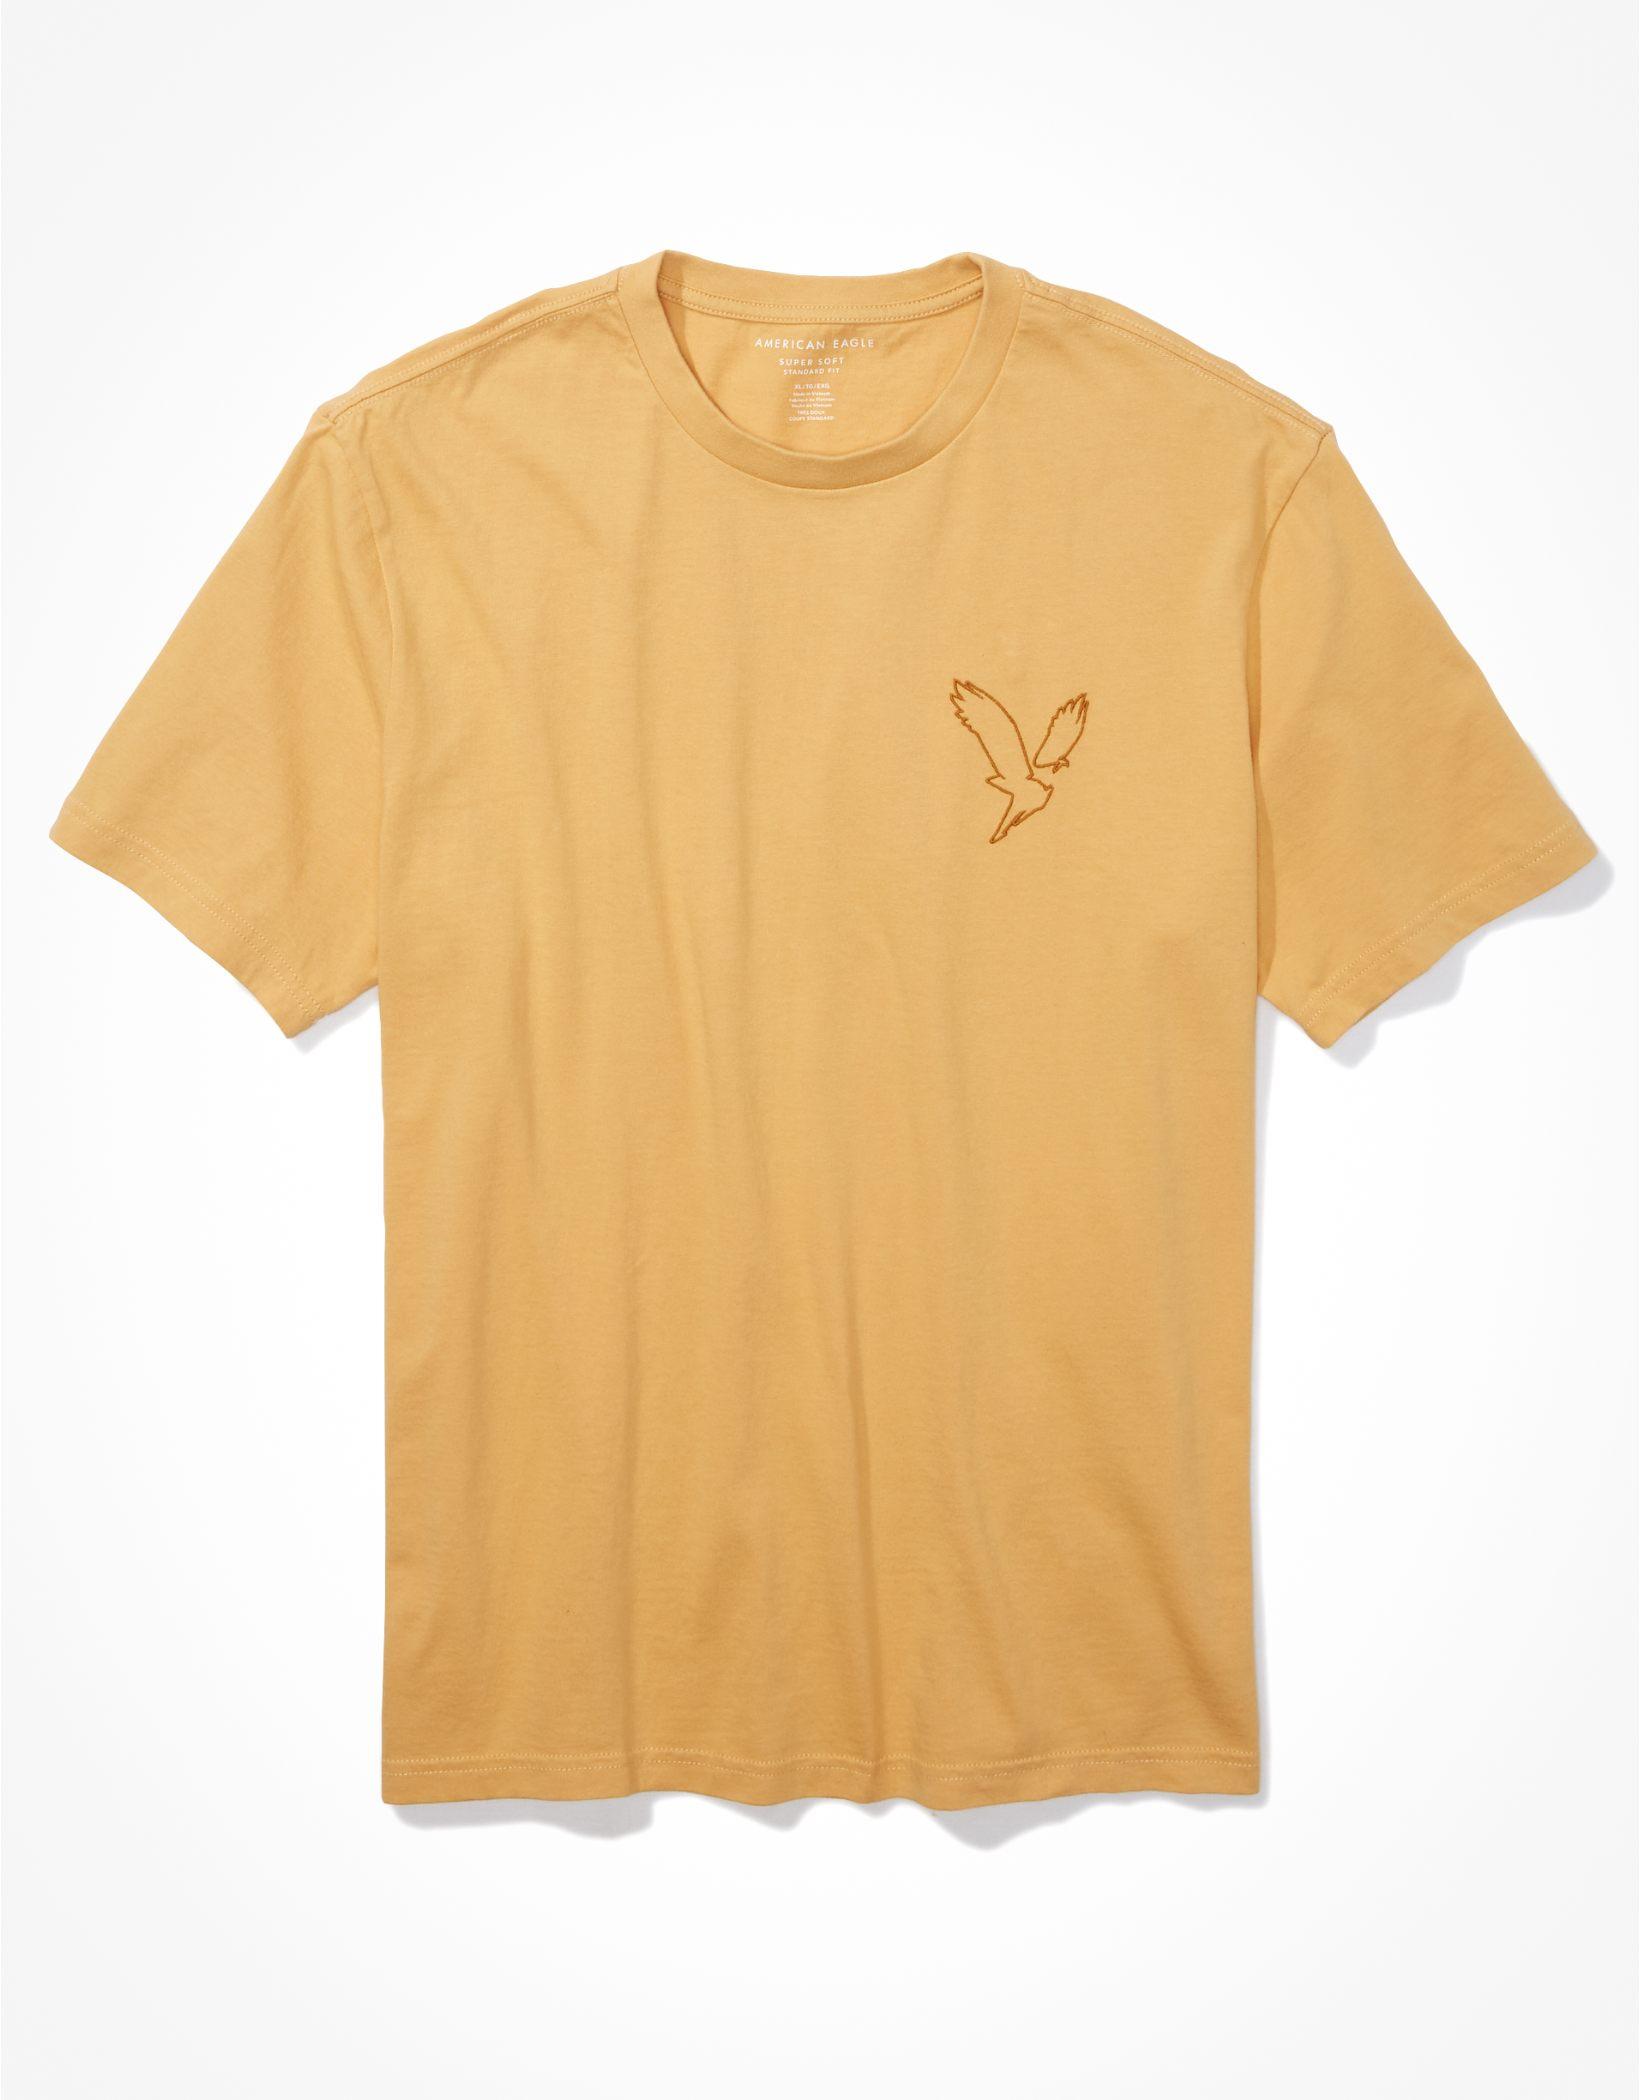 AE Super Soft Graphic T-Shirt